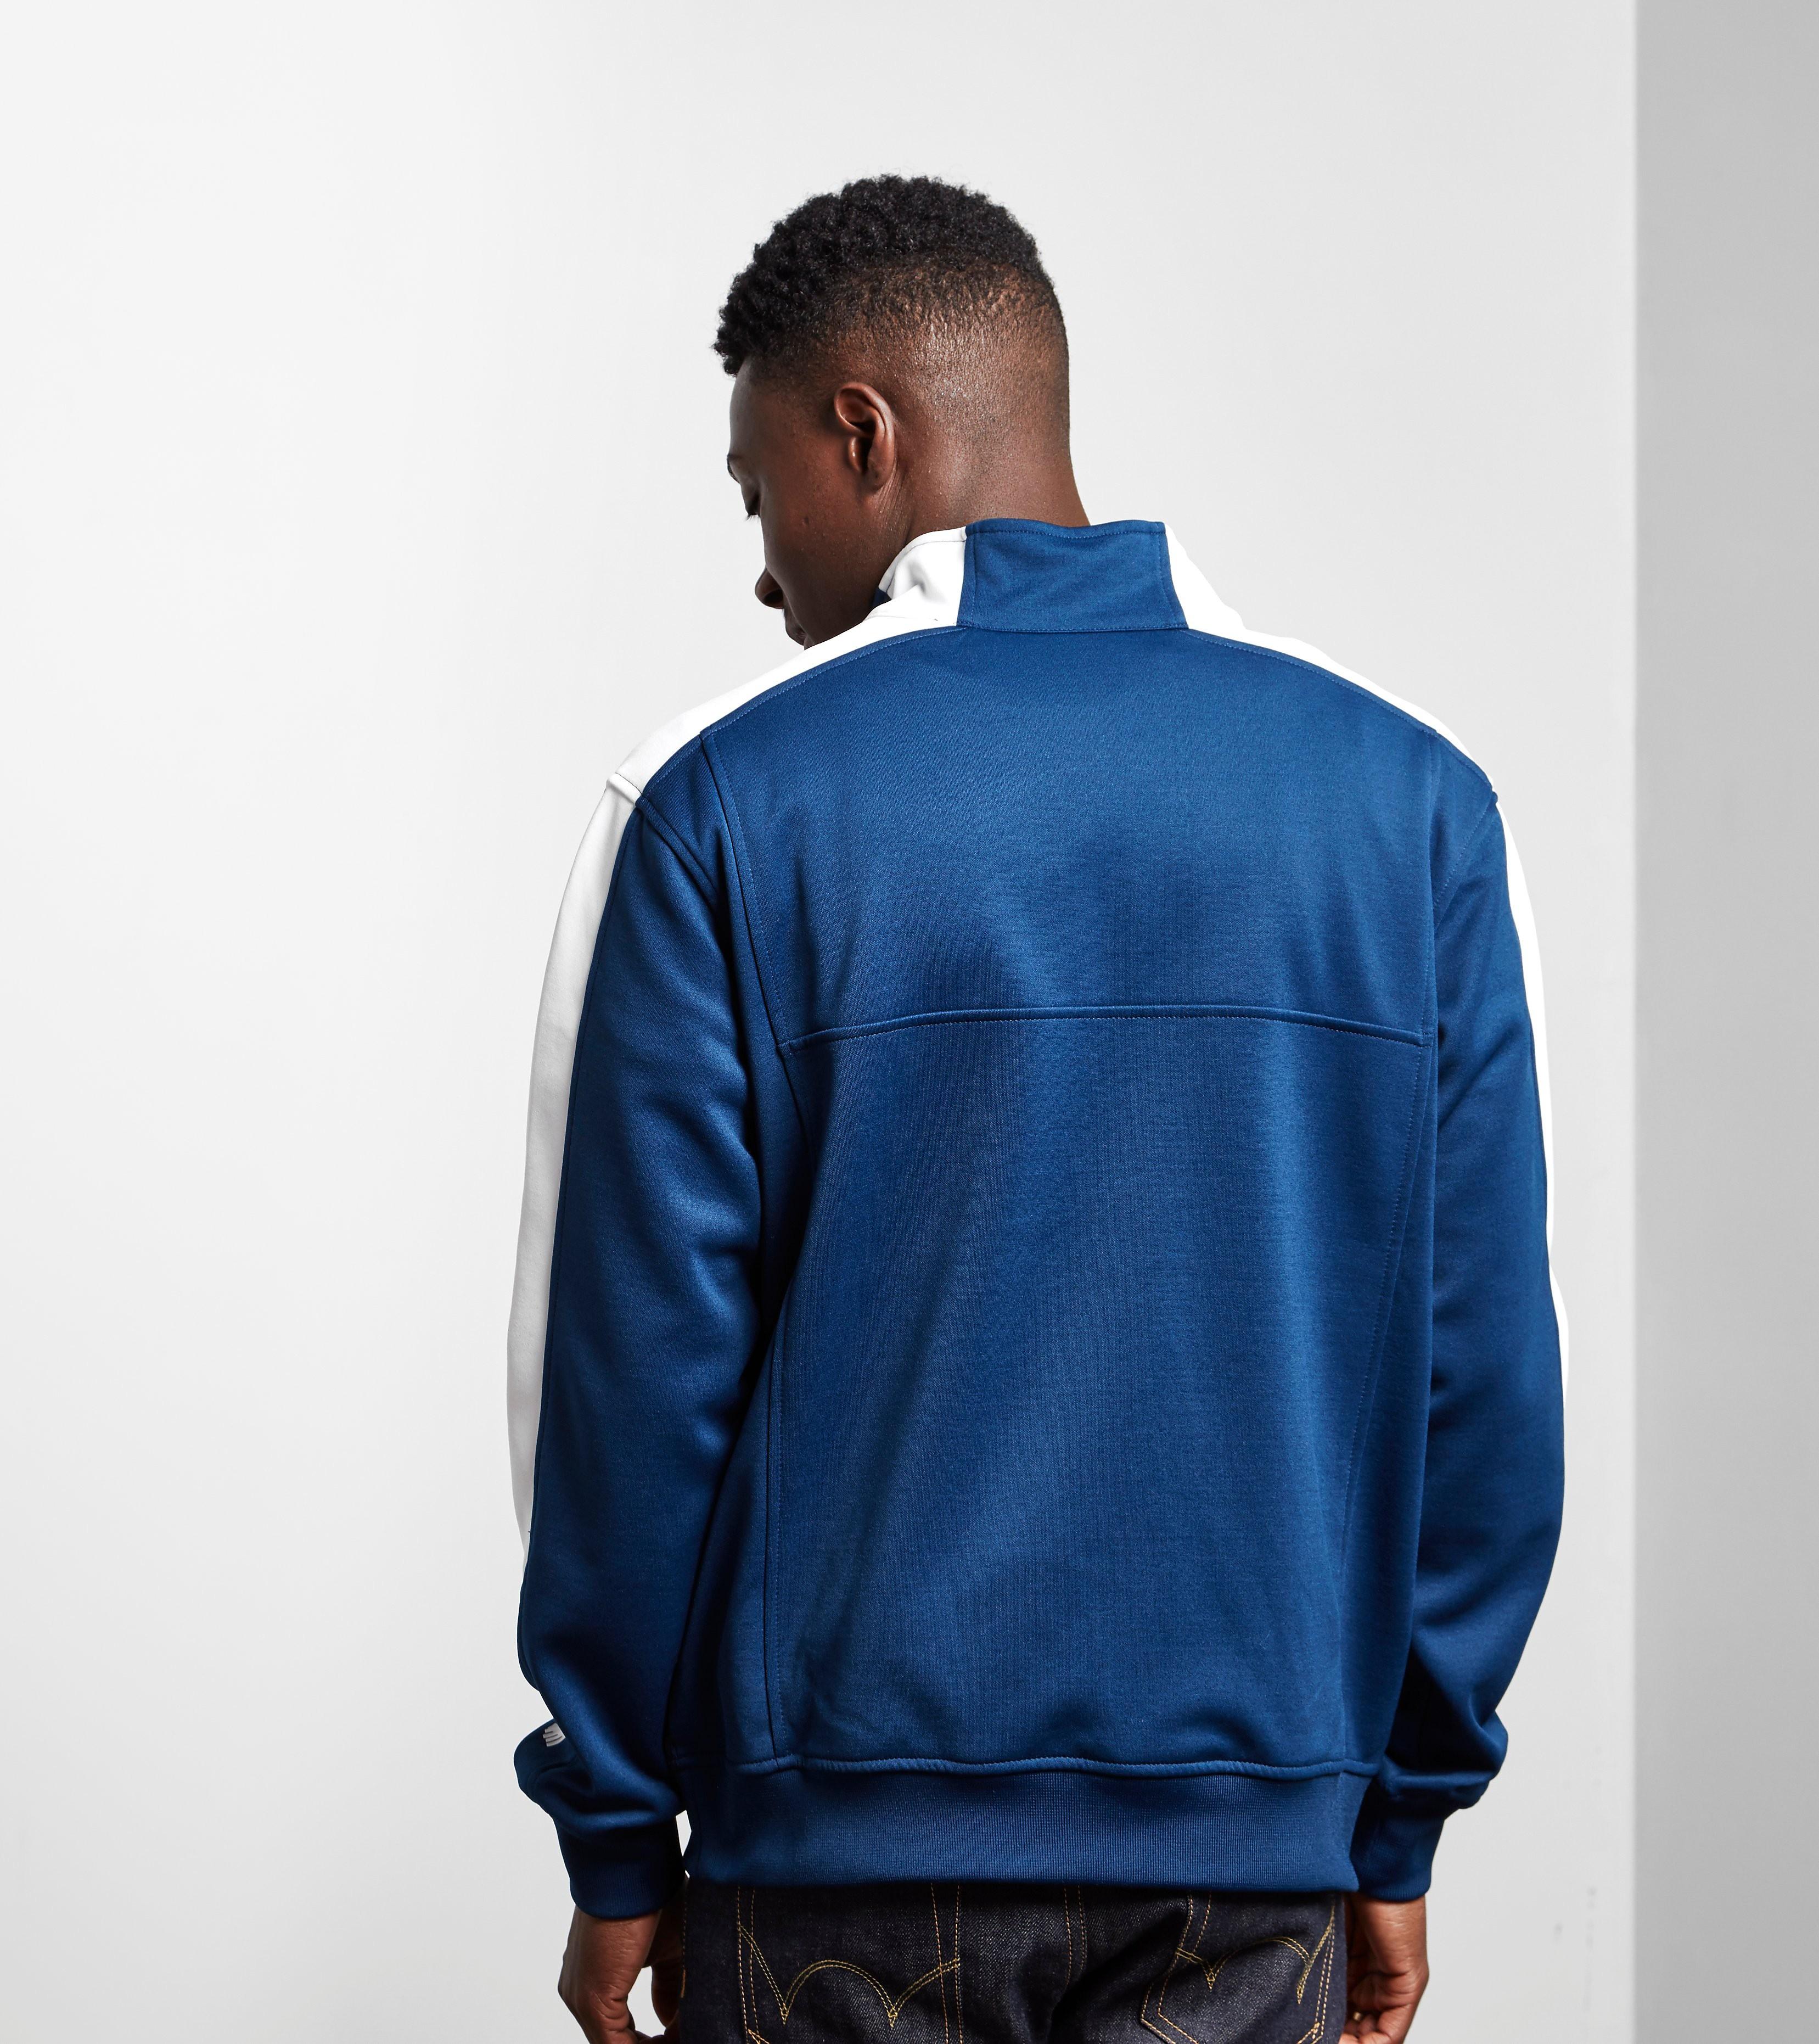 Undefeated 5 Strike Hooded Fleece Jacket